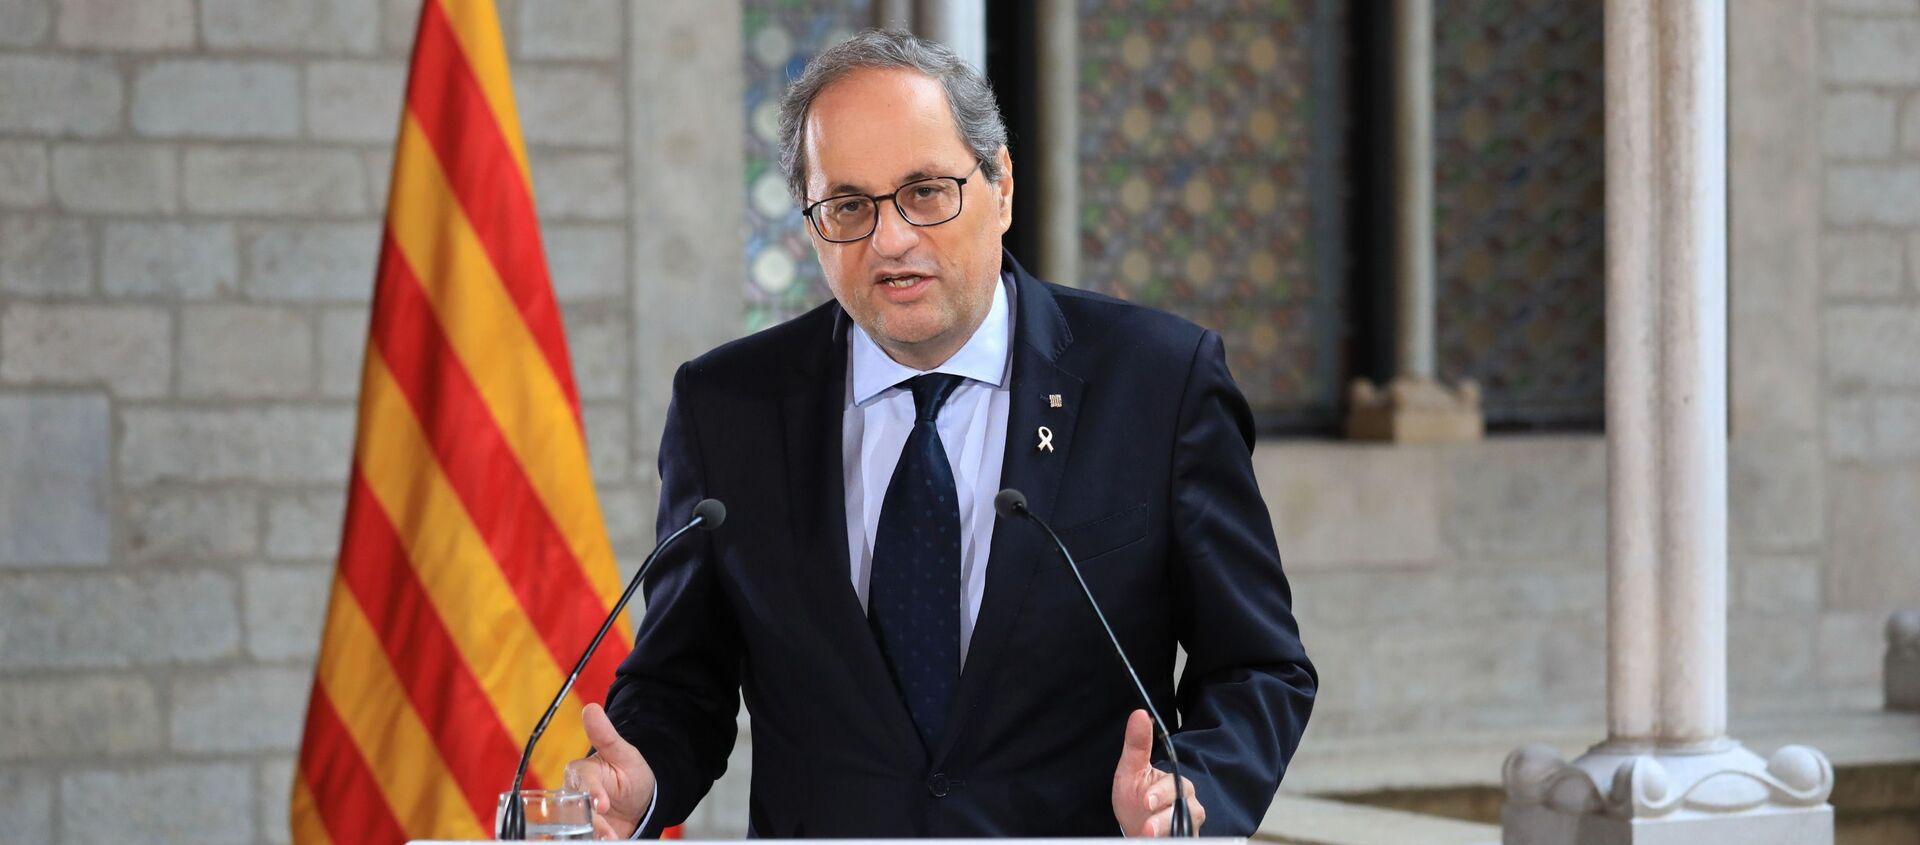 El presidente de la Generalitat de Catalunya, Quim Torra, durante un discurso en Barcelona - Sputnik Mundo, 1920, 17.09.2020